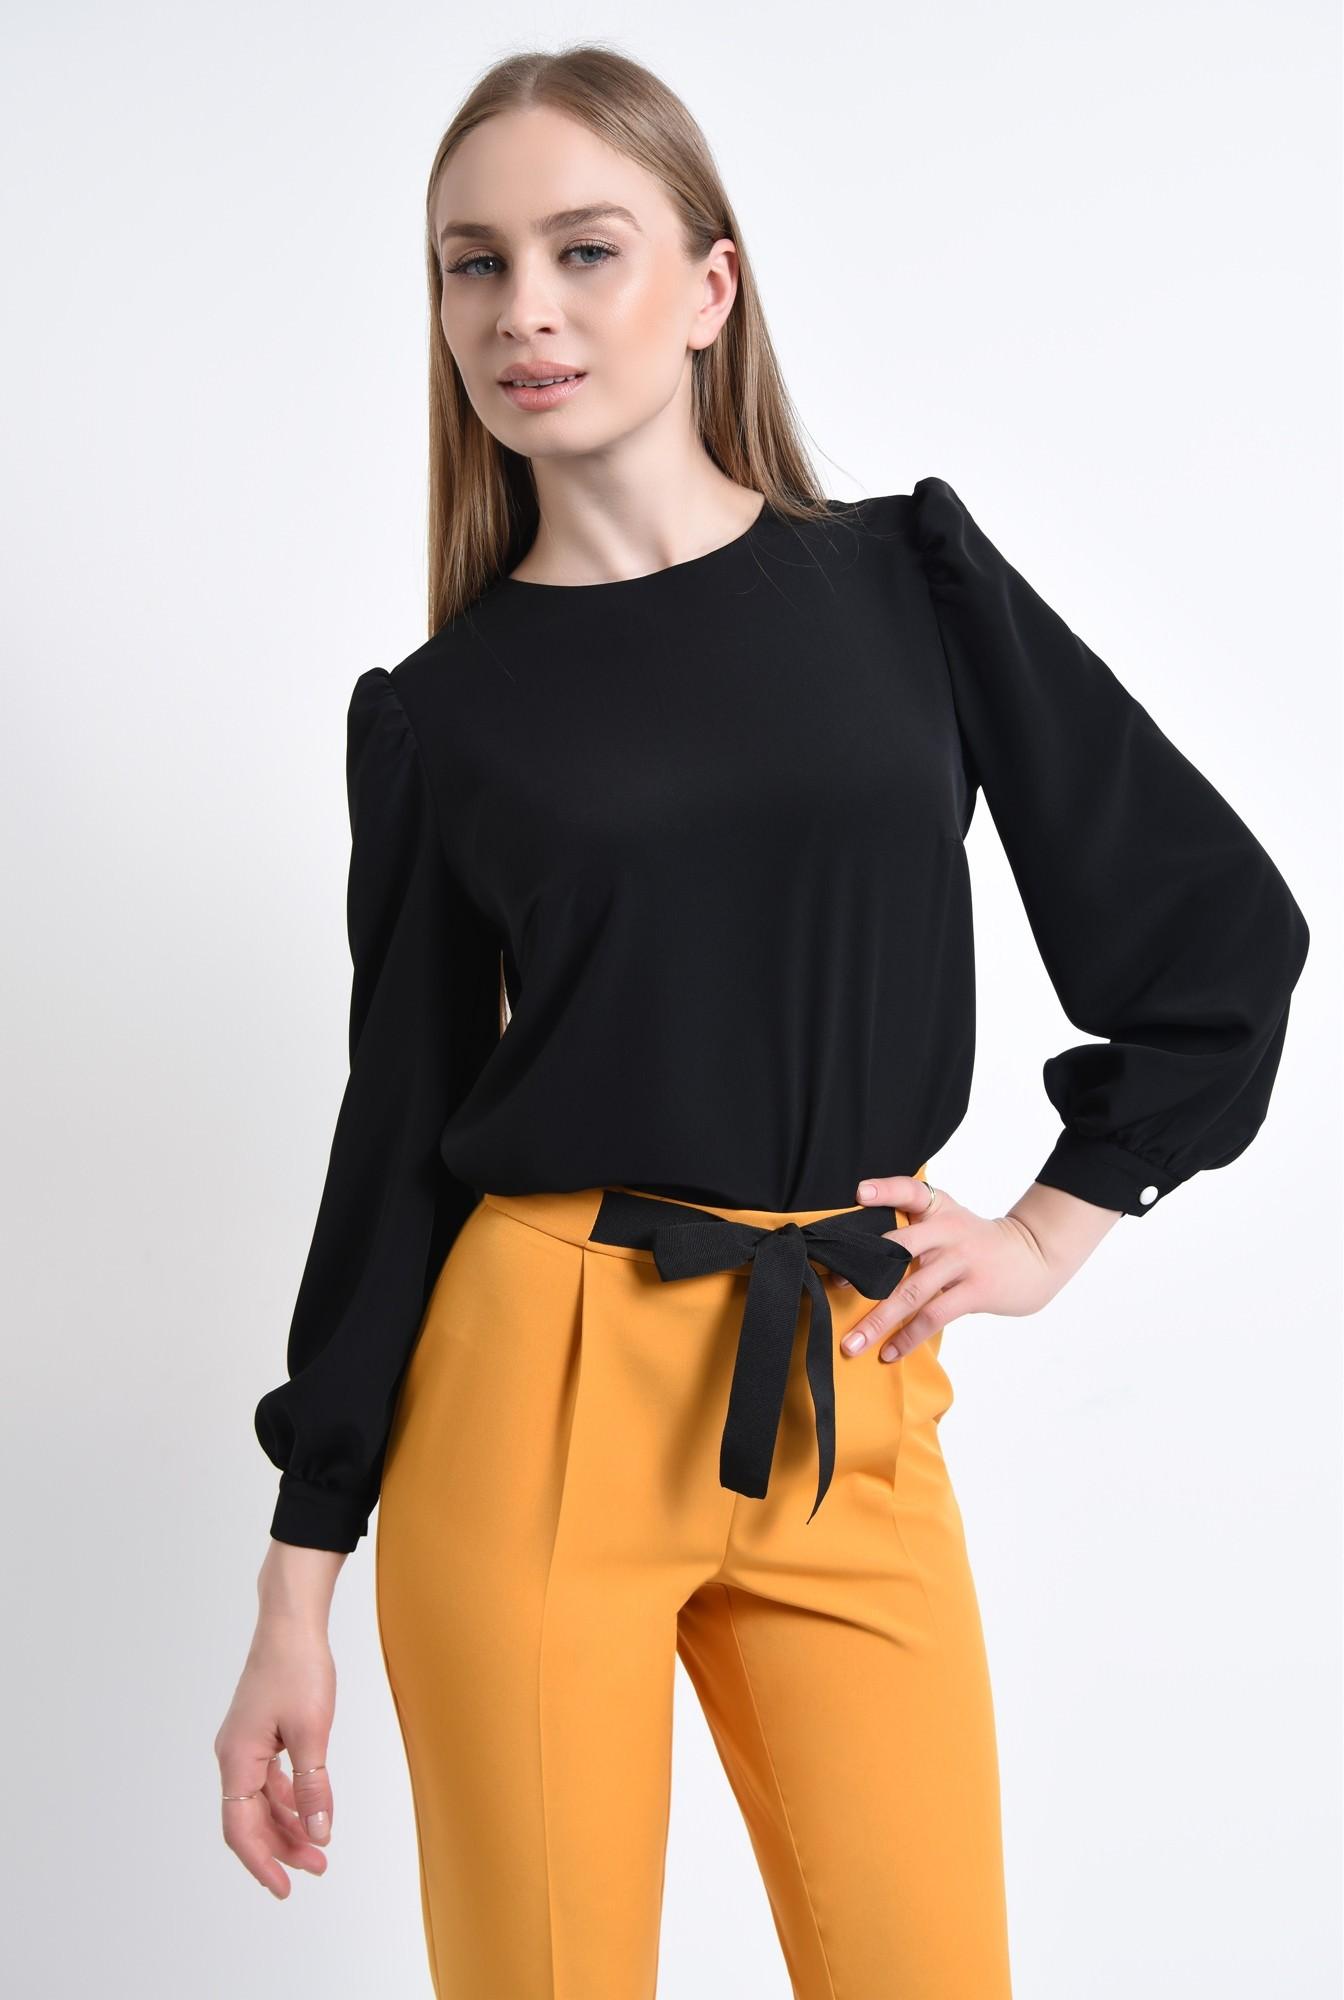 0 - 360 - Bluza casual neagra, decolteu rotund